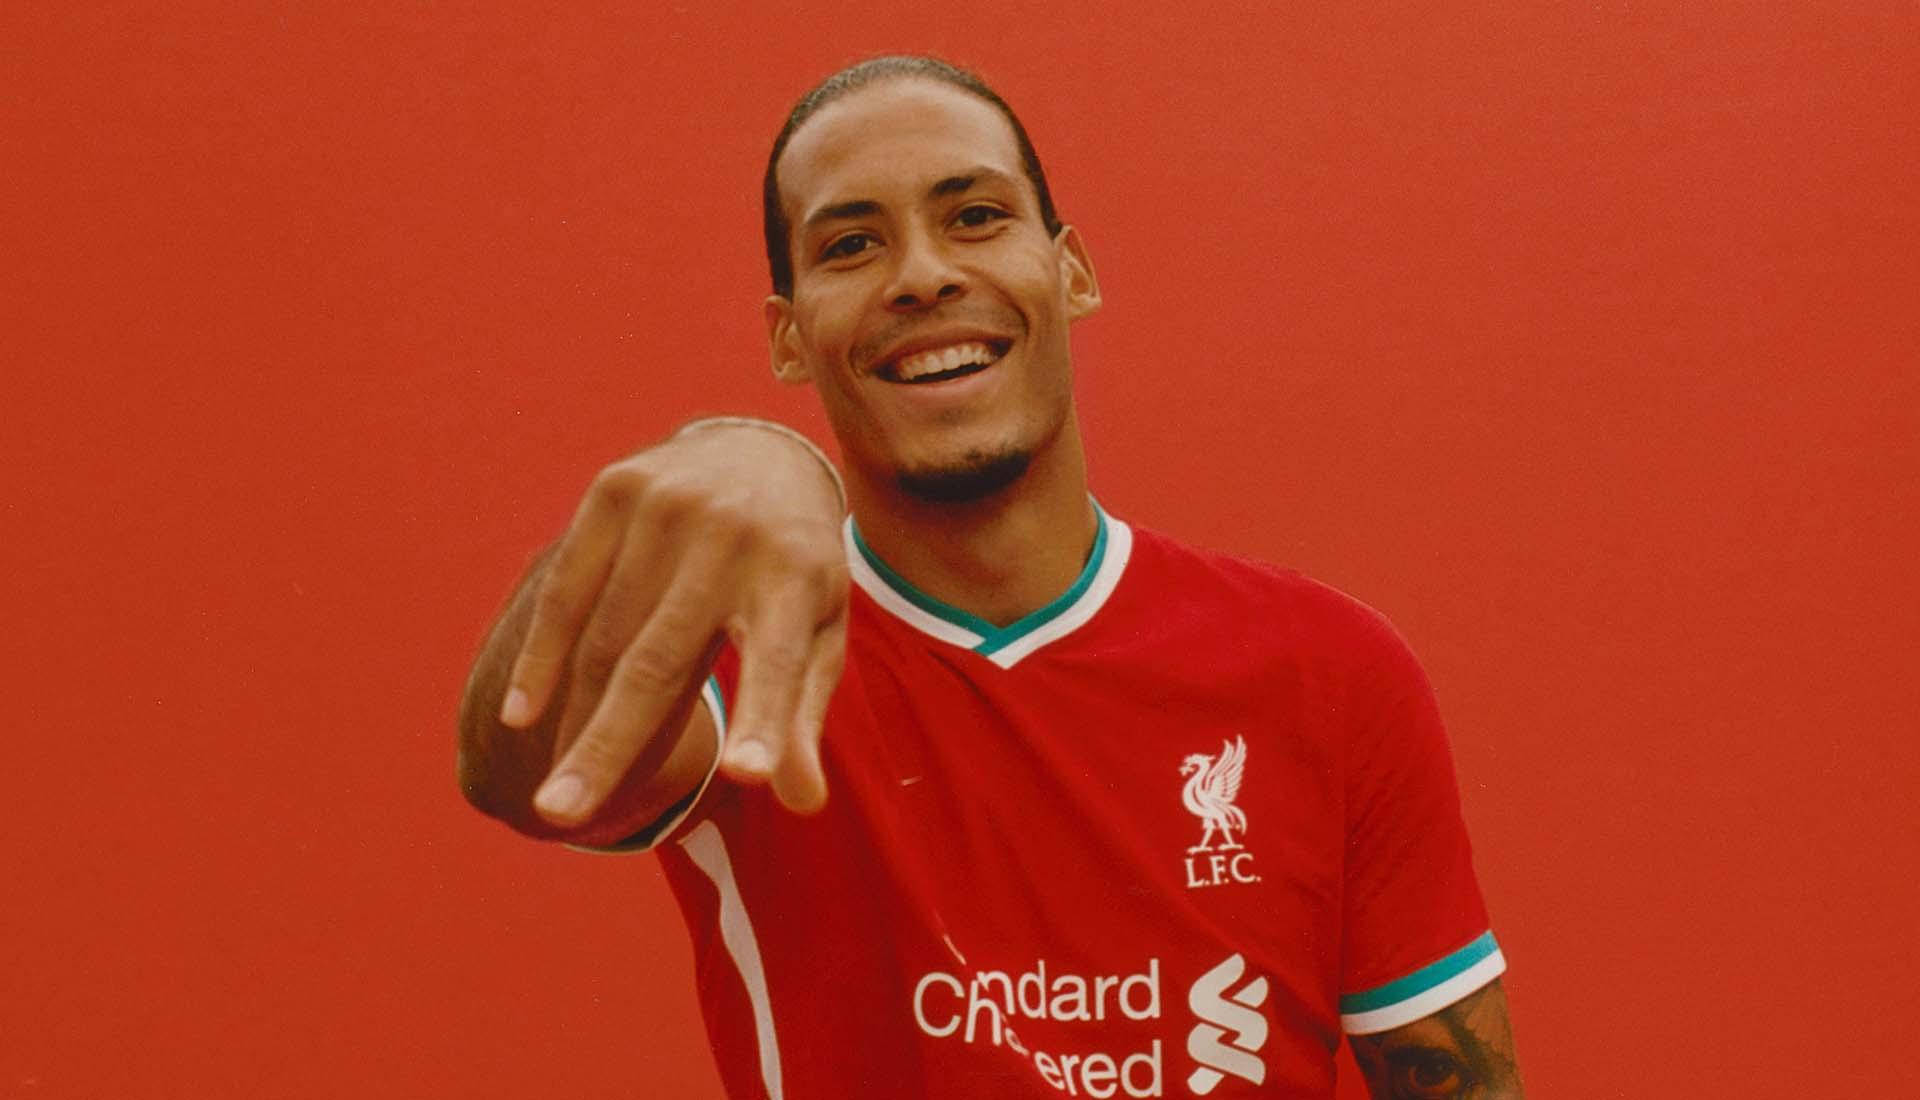 The Dial Up 16 Virgil Van Dijk Soccerbible